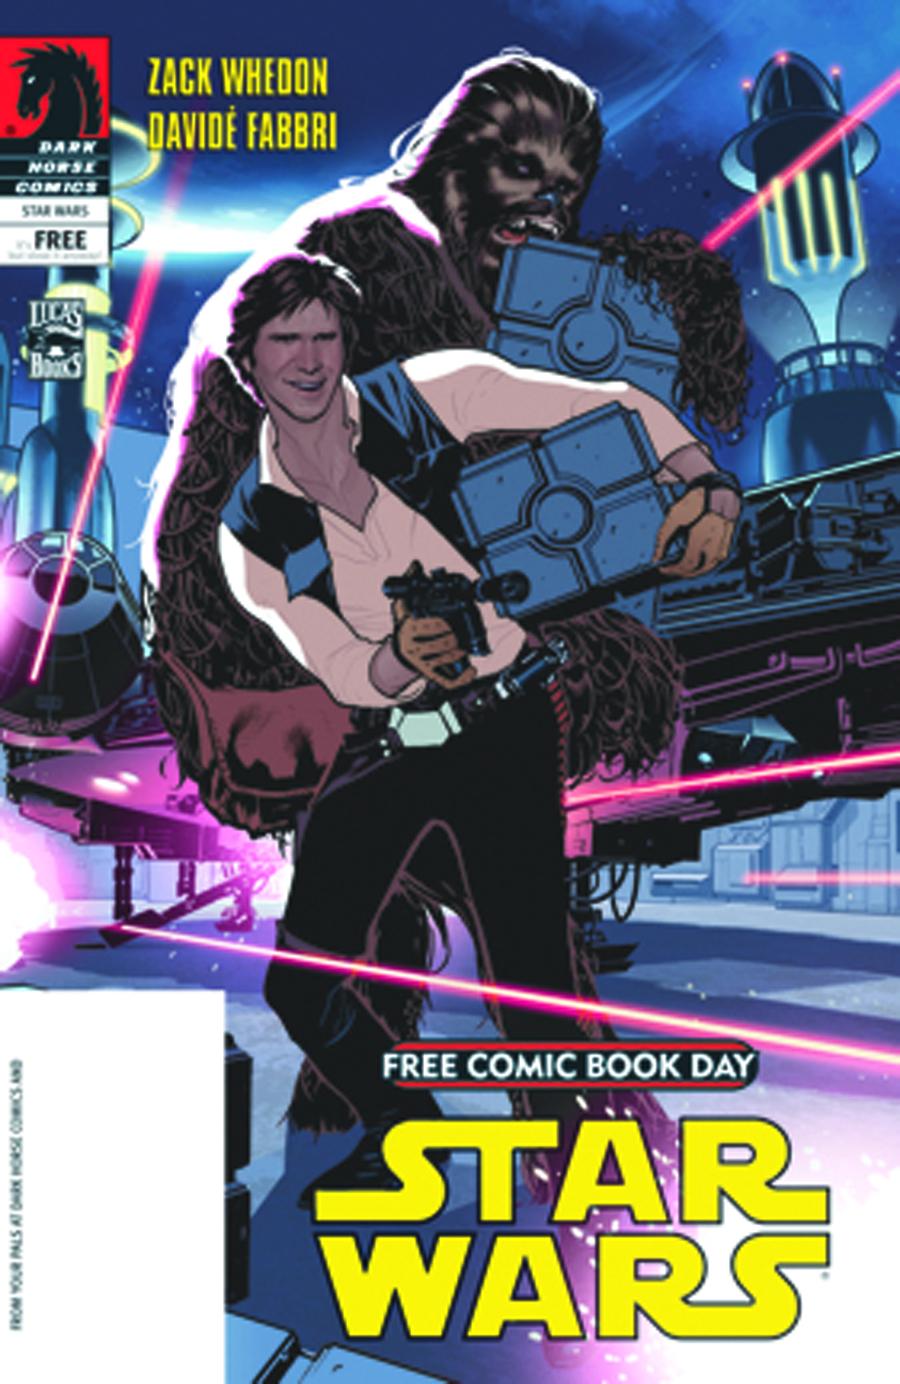 STK459374 Free Comic Book Day 2012: Reviews!